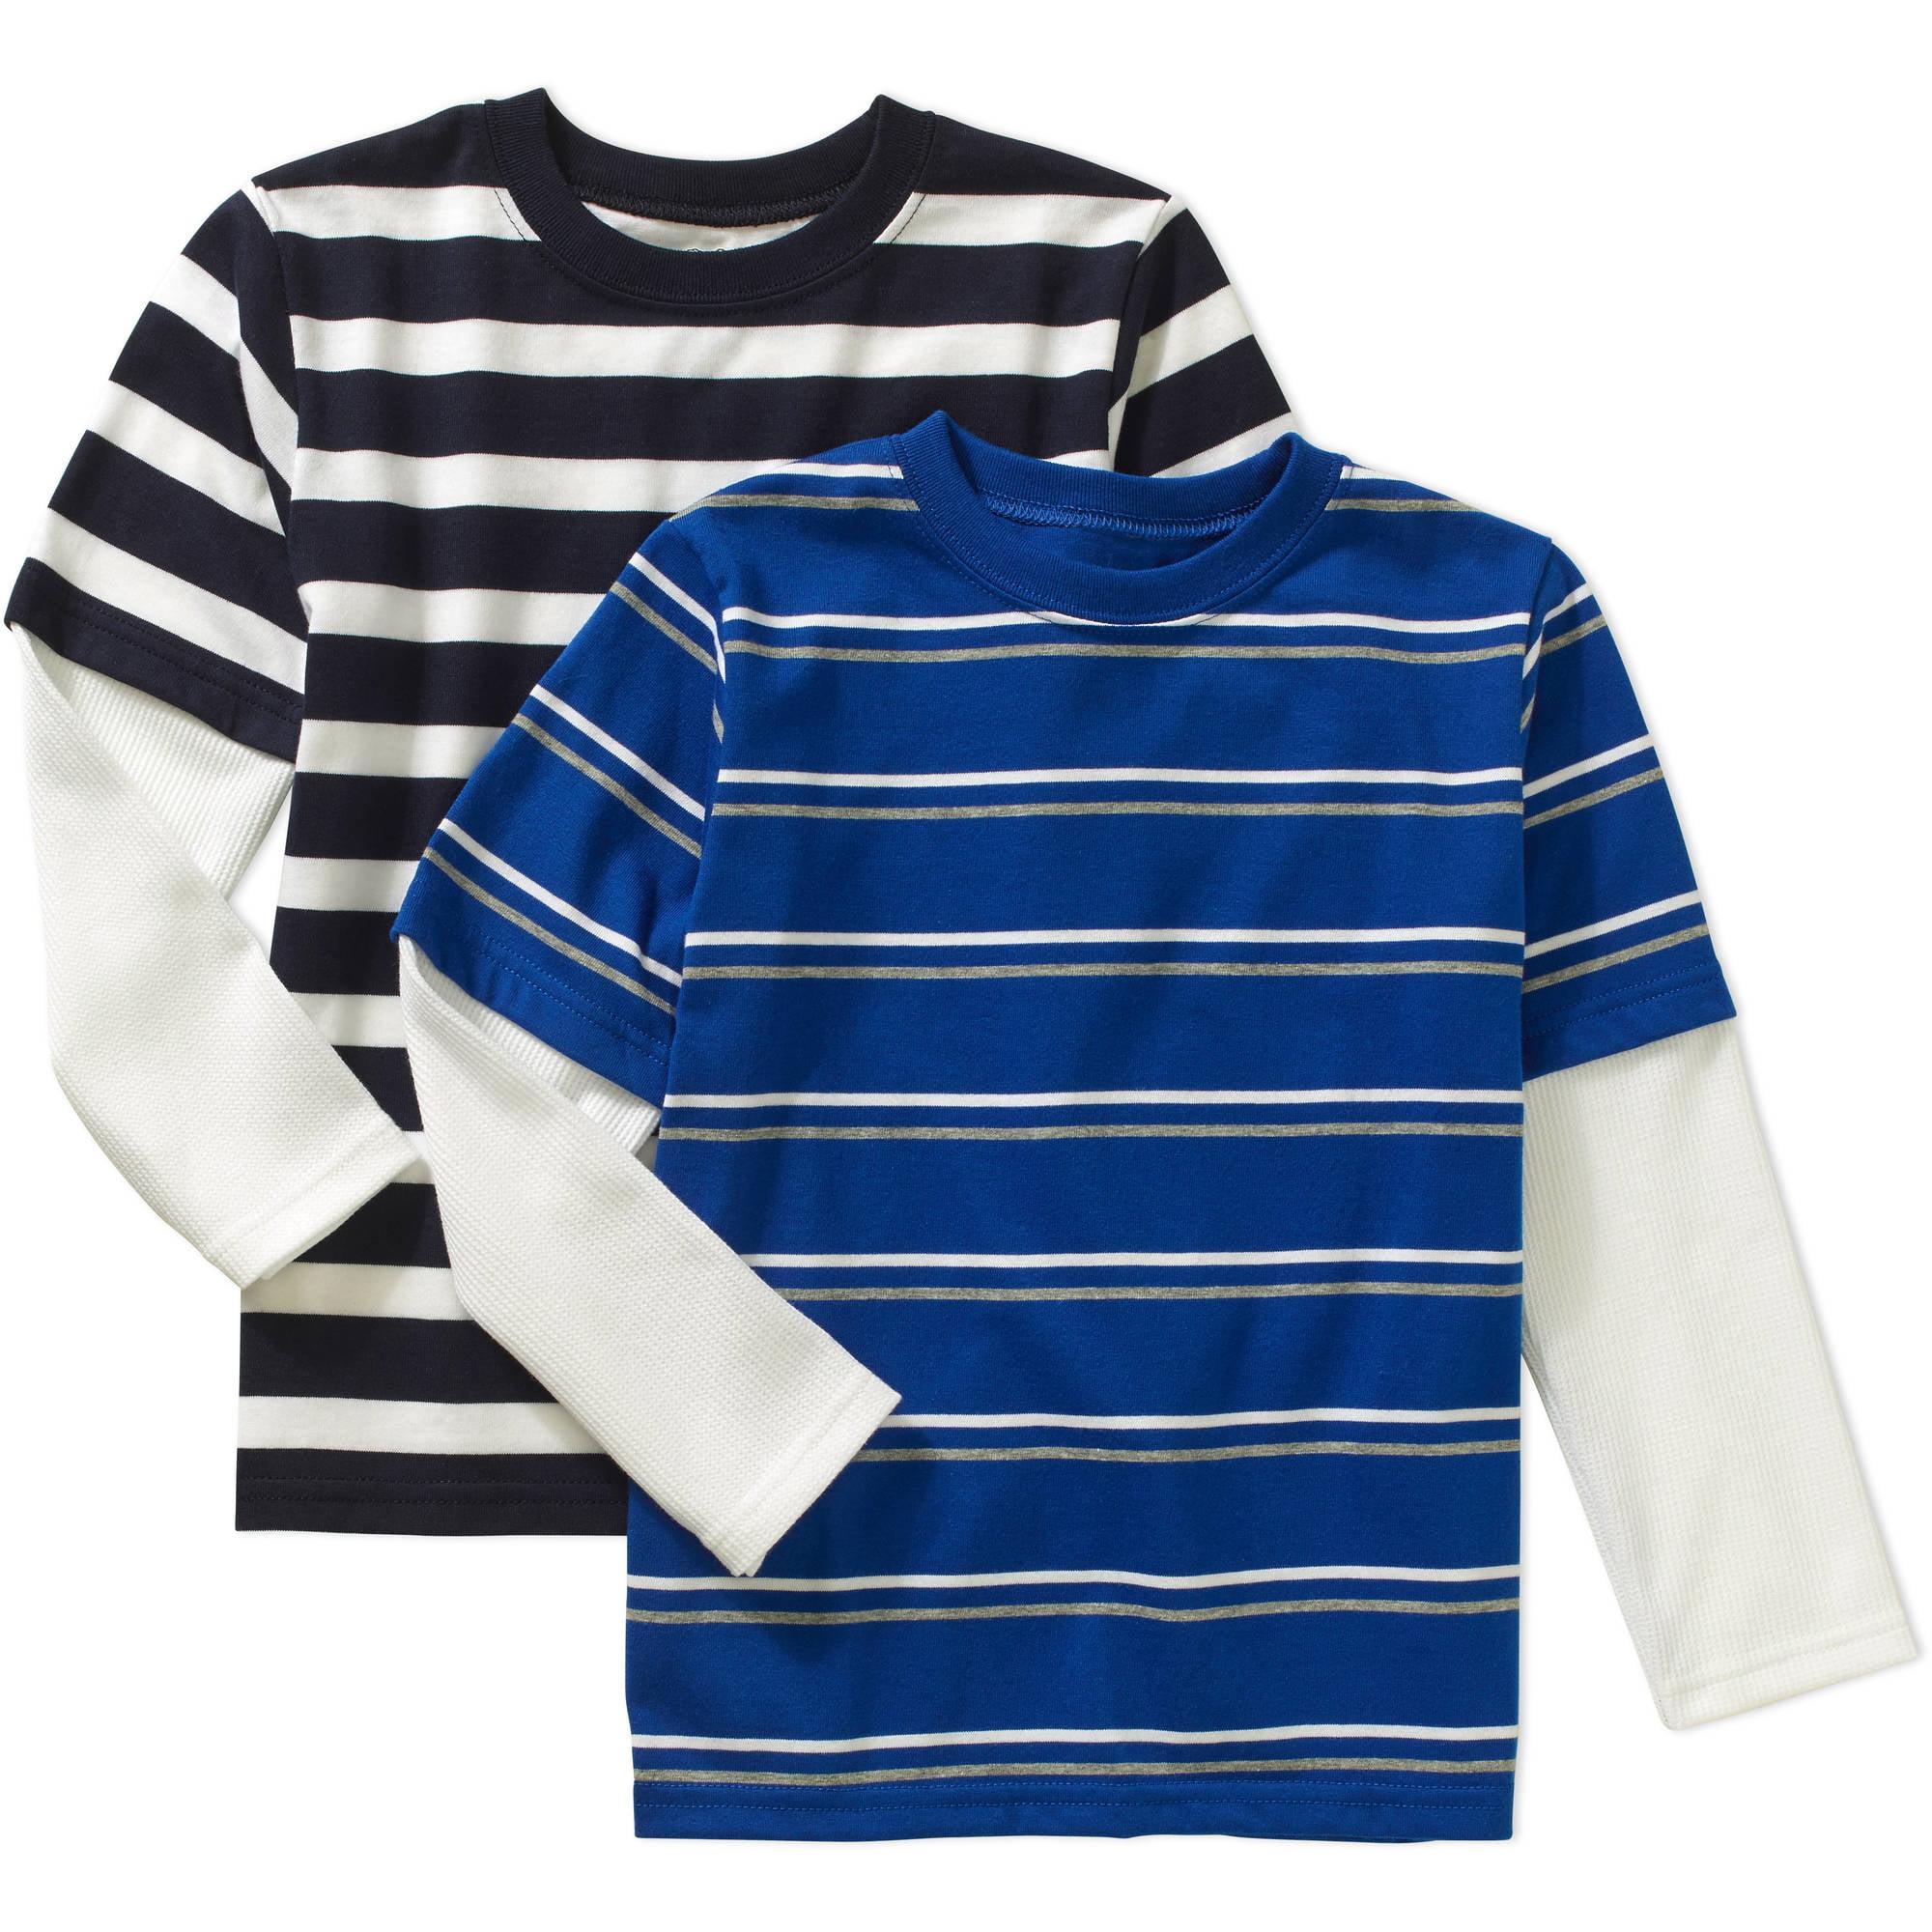 Image of 365 Kids from Garanimals Boys' 2-Piece Long Sleeve Stripe Hangdown Tee Set